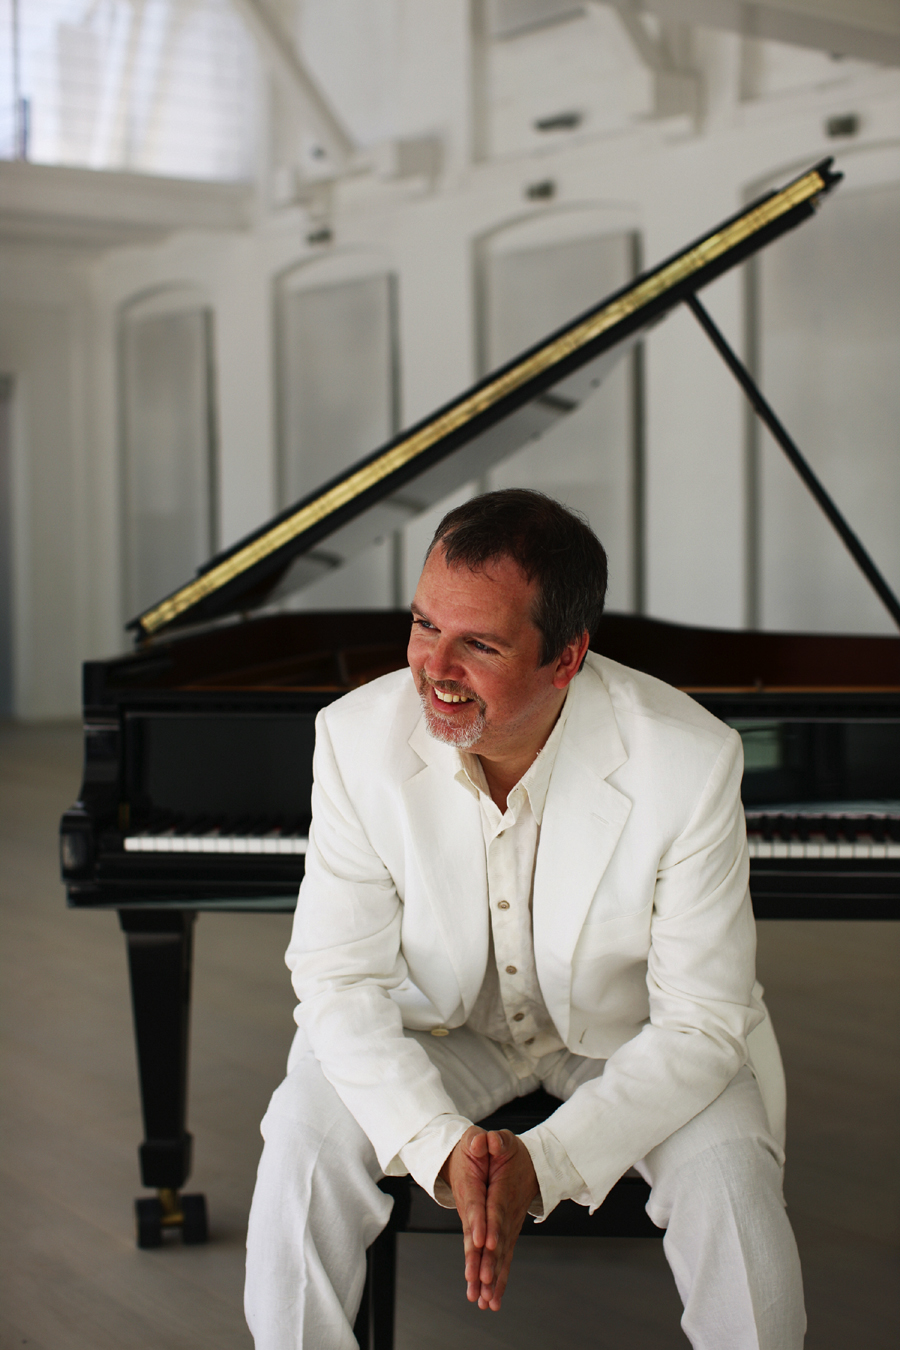 Niklas Sivelov